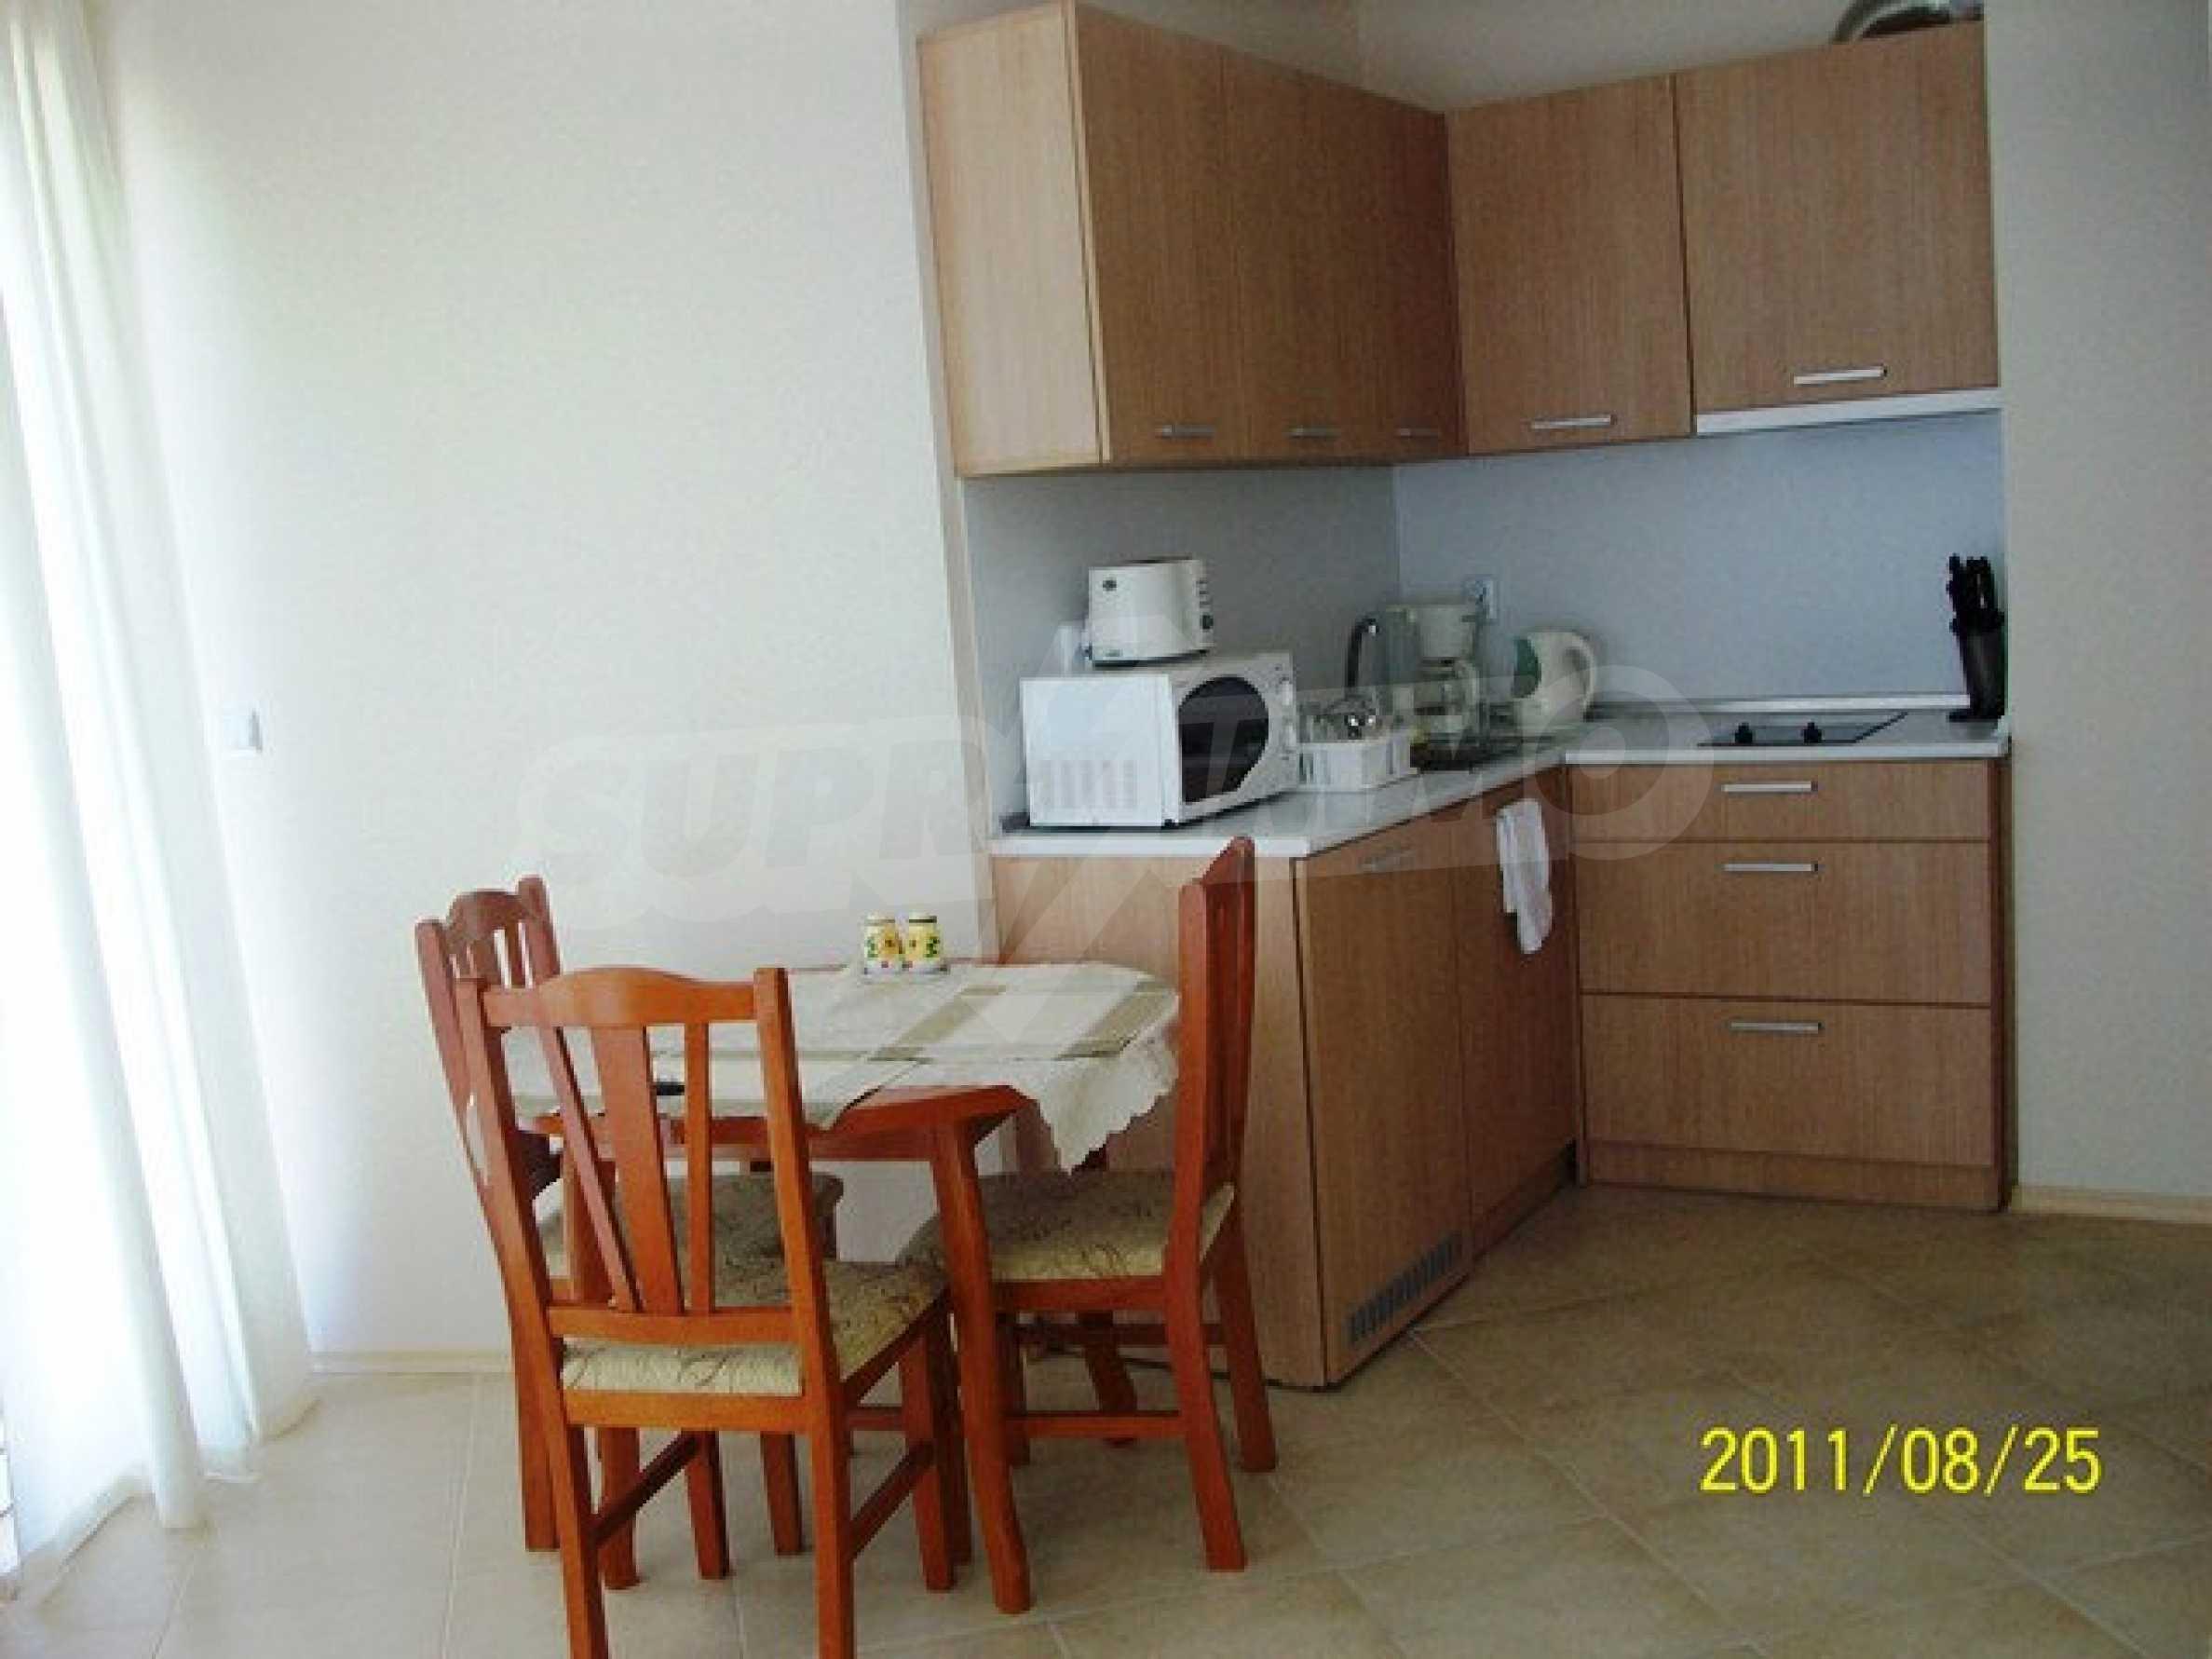 Трехкомнатный апартамент на продажу в комплексе Emberli в курорте Лозенец 14